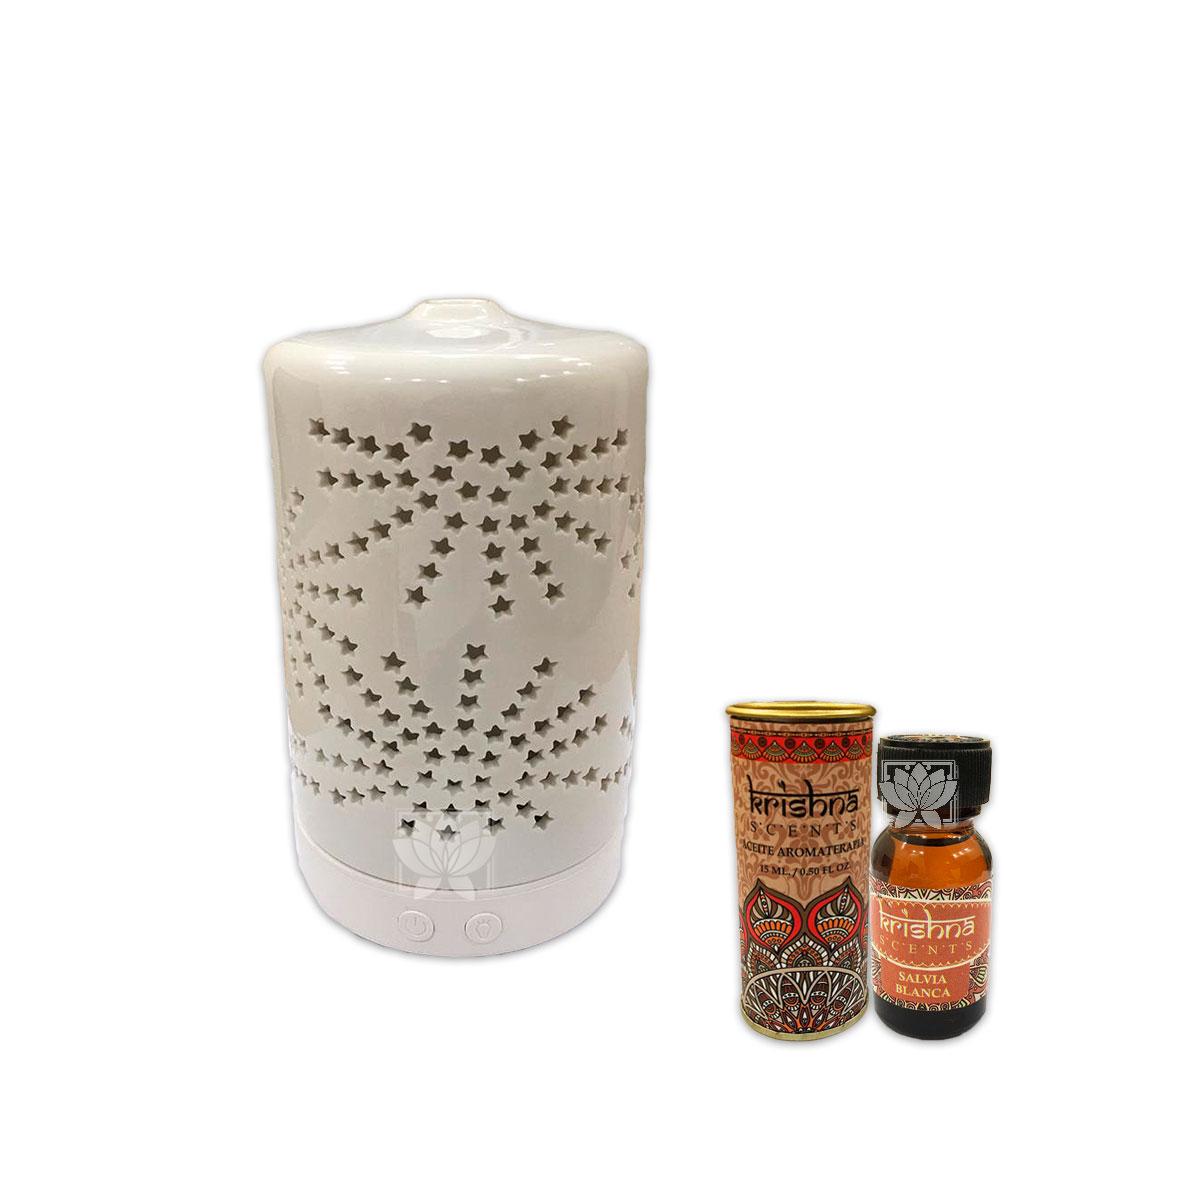 Humidificador Cilindro + Esencia Krishna 15 ml